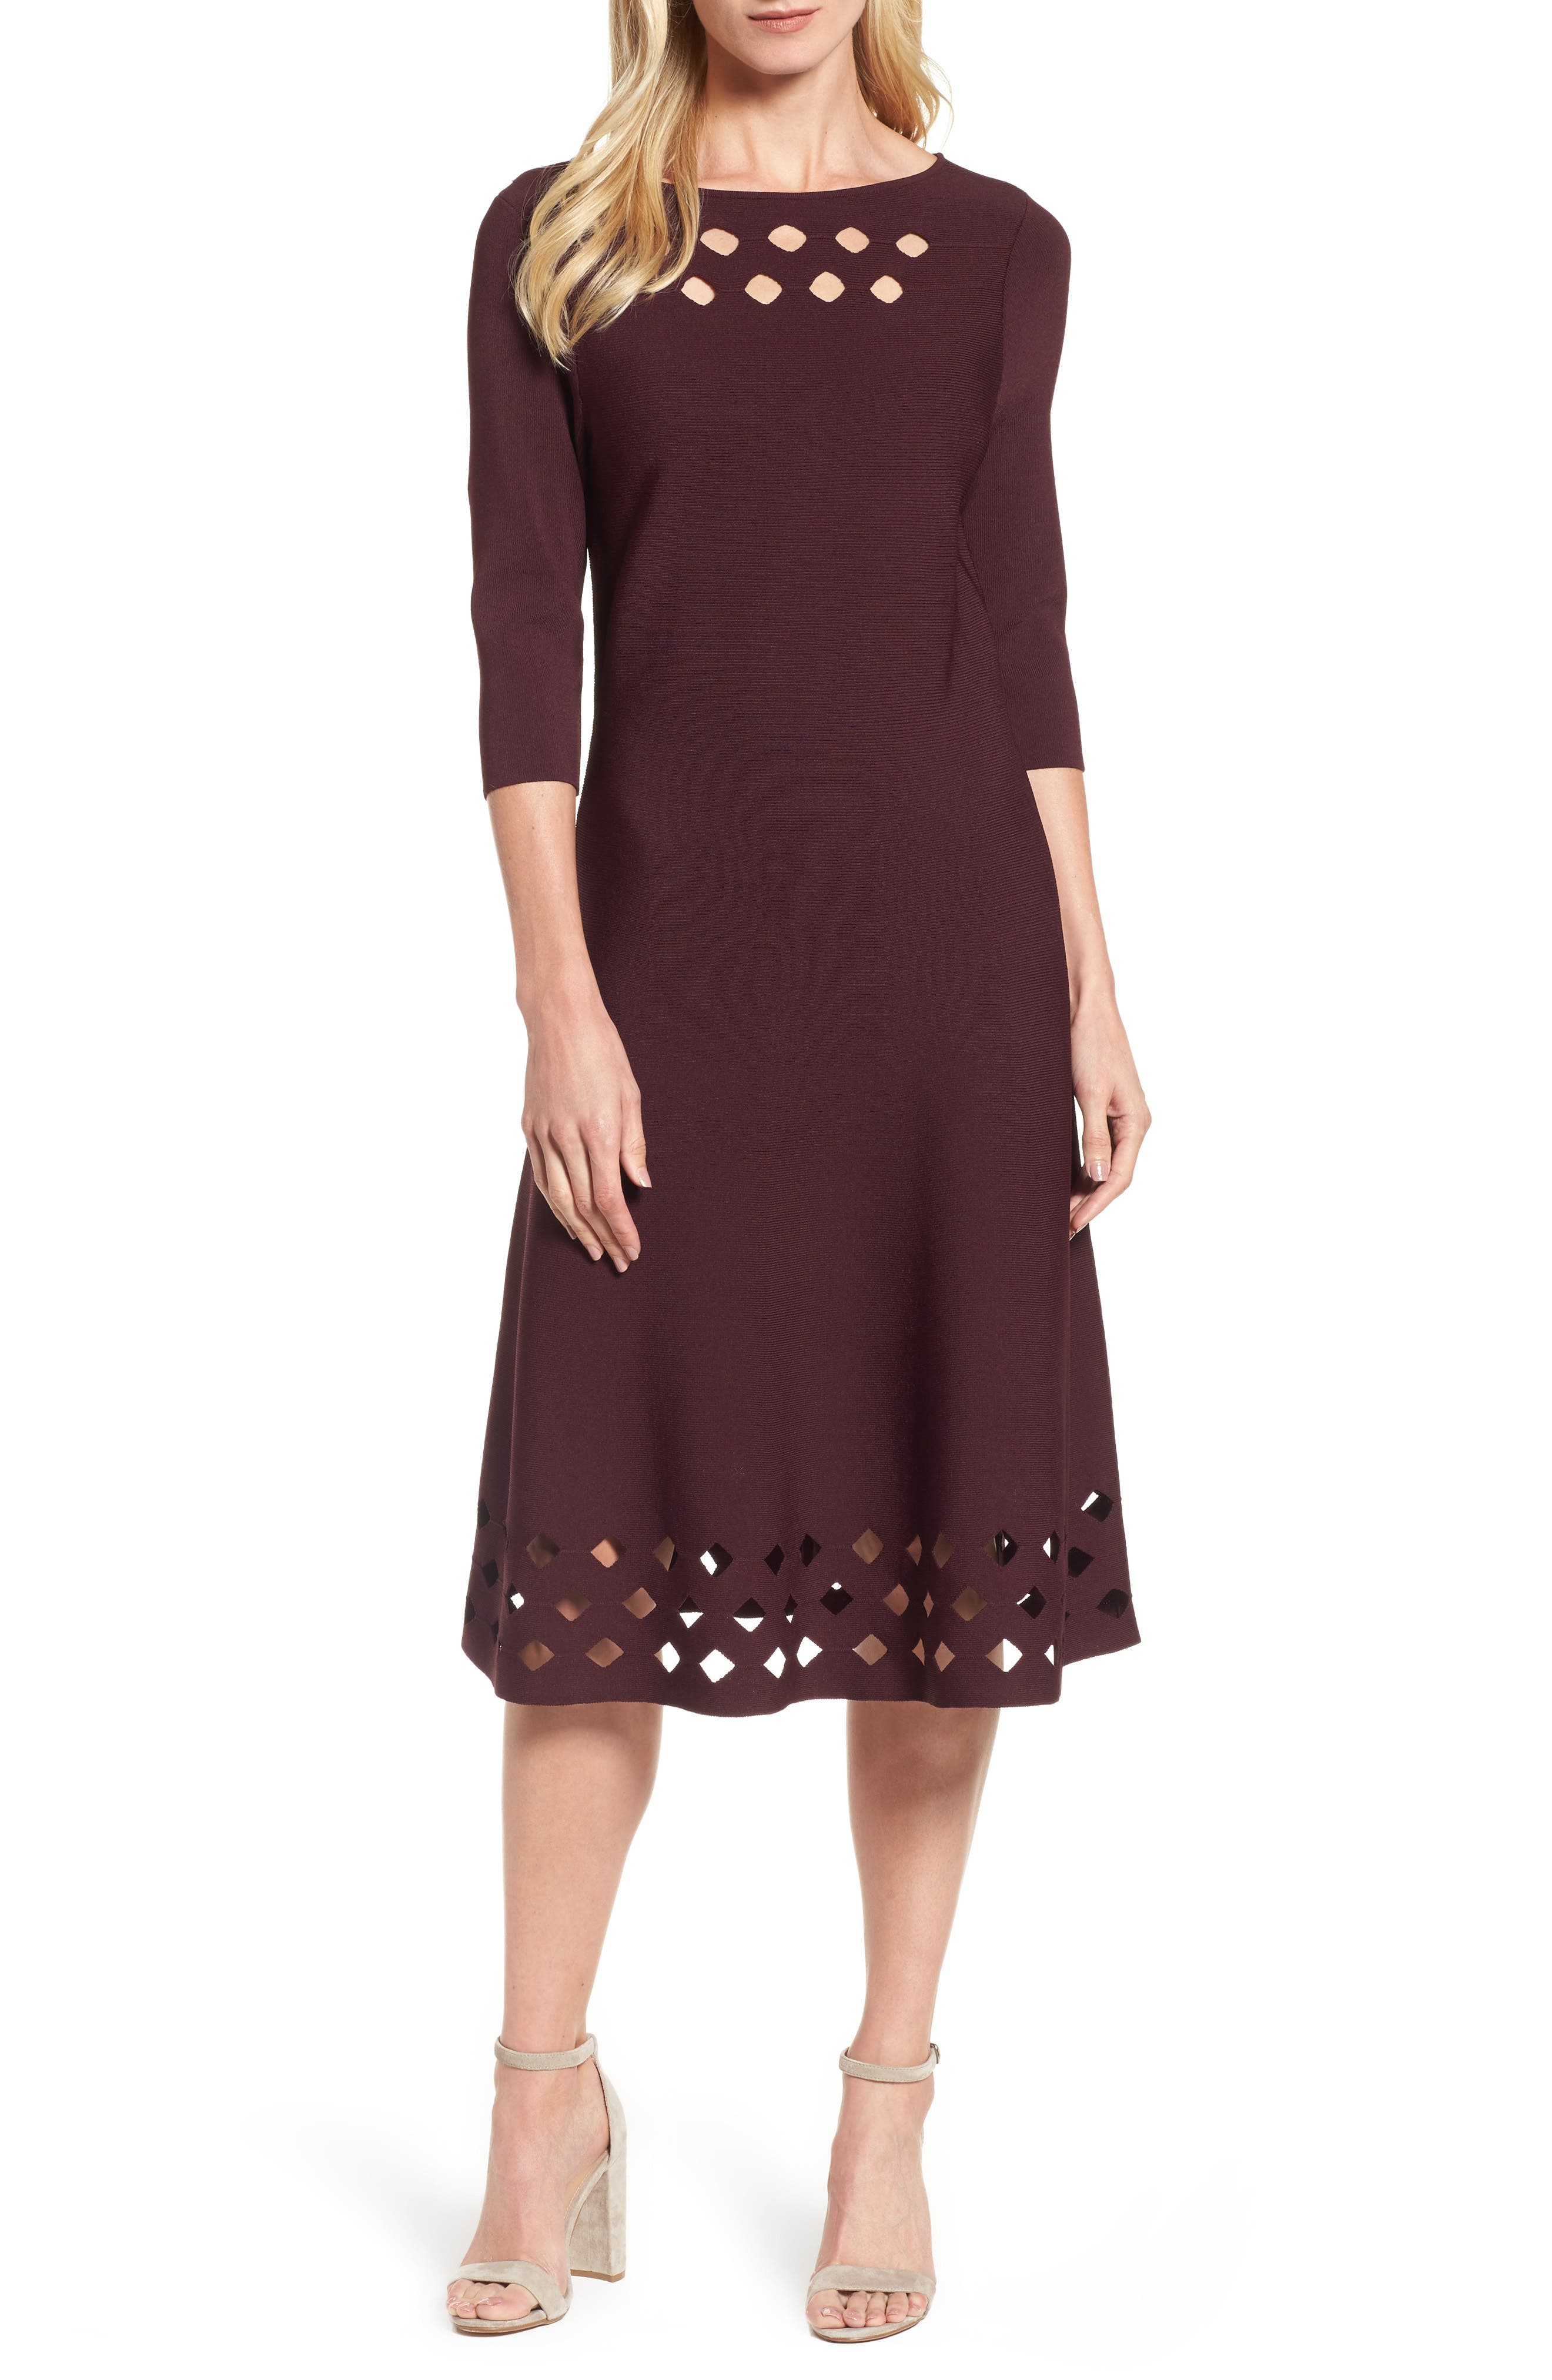 Main Image - NIC+ZOE Time Out Twirl Midi Dress (Regular & Petite)